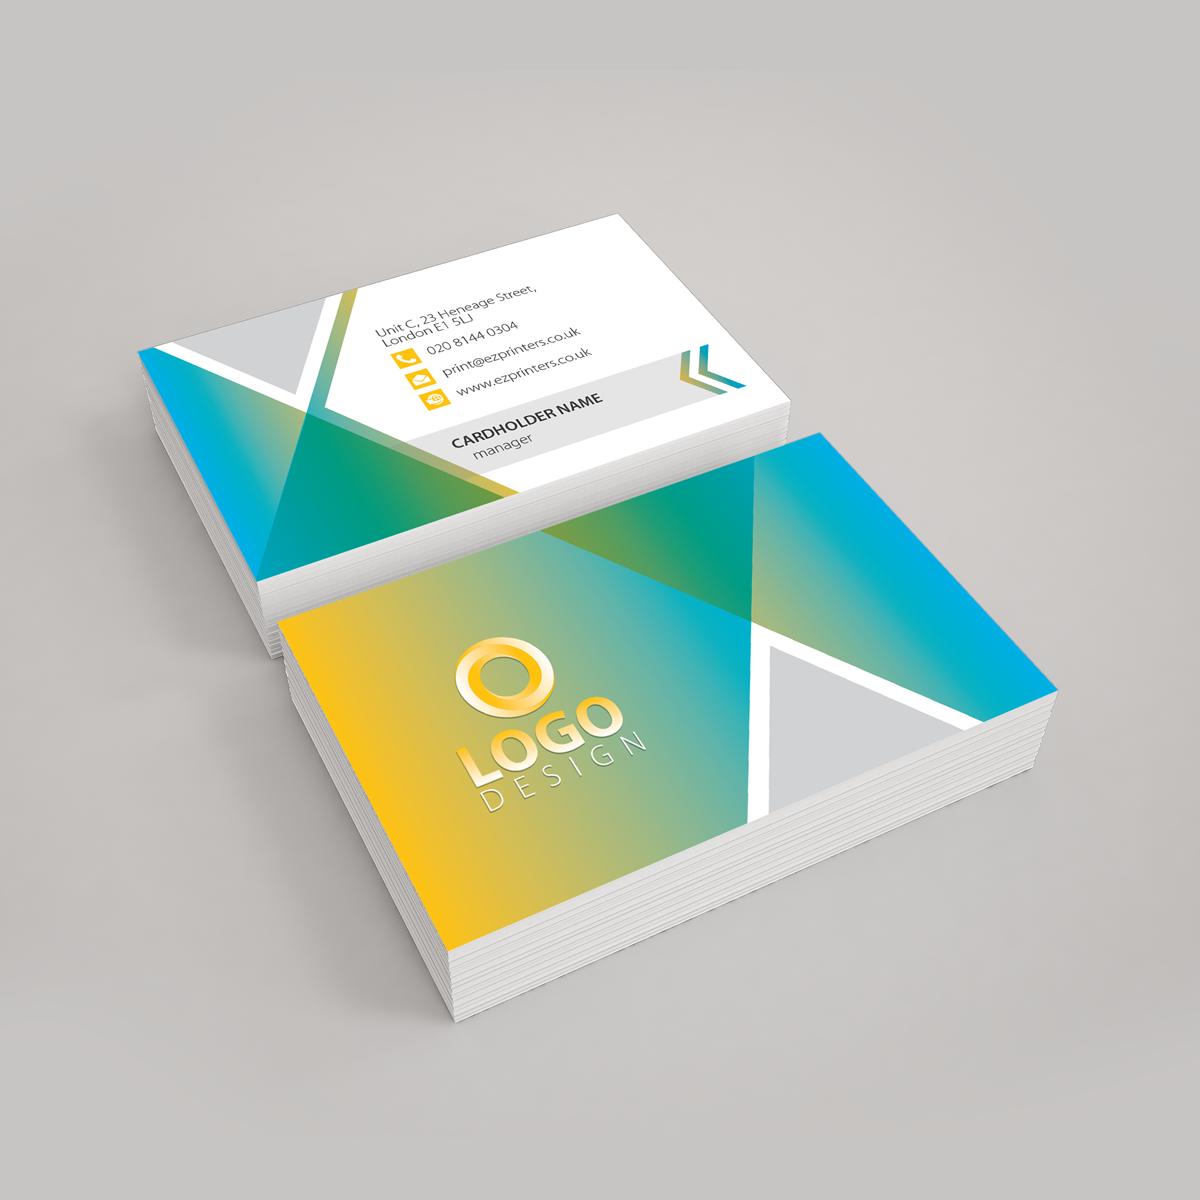 Business Card Printing Dubai Business Card Printer Printing Business Cards Name Card Printing